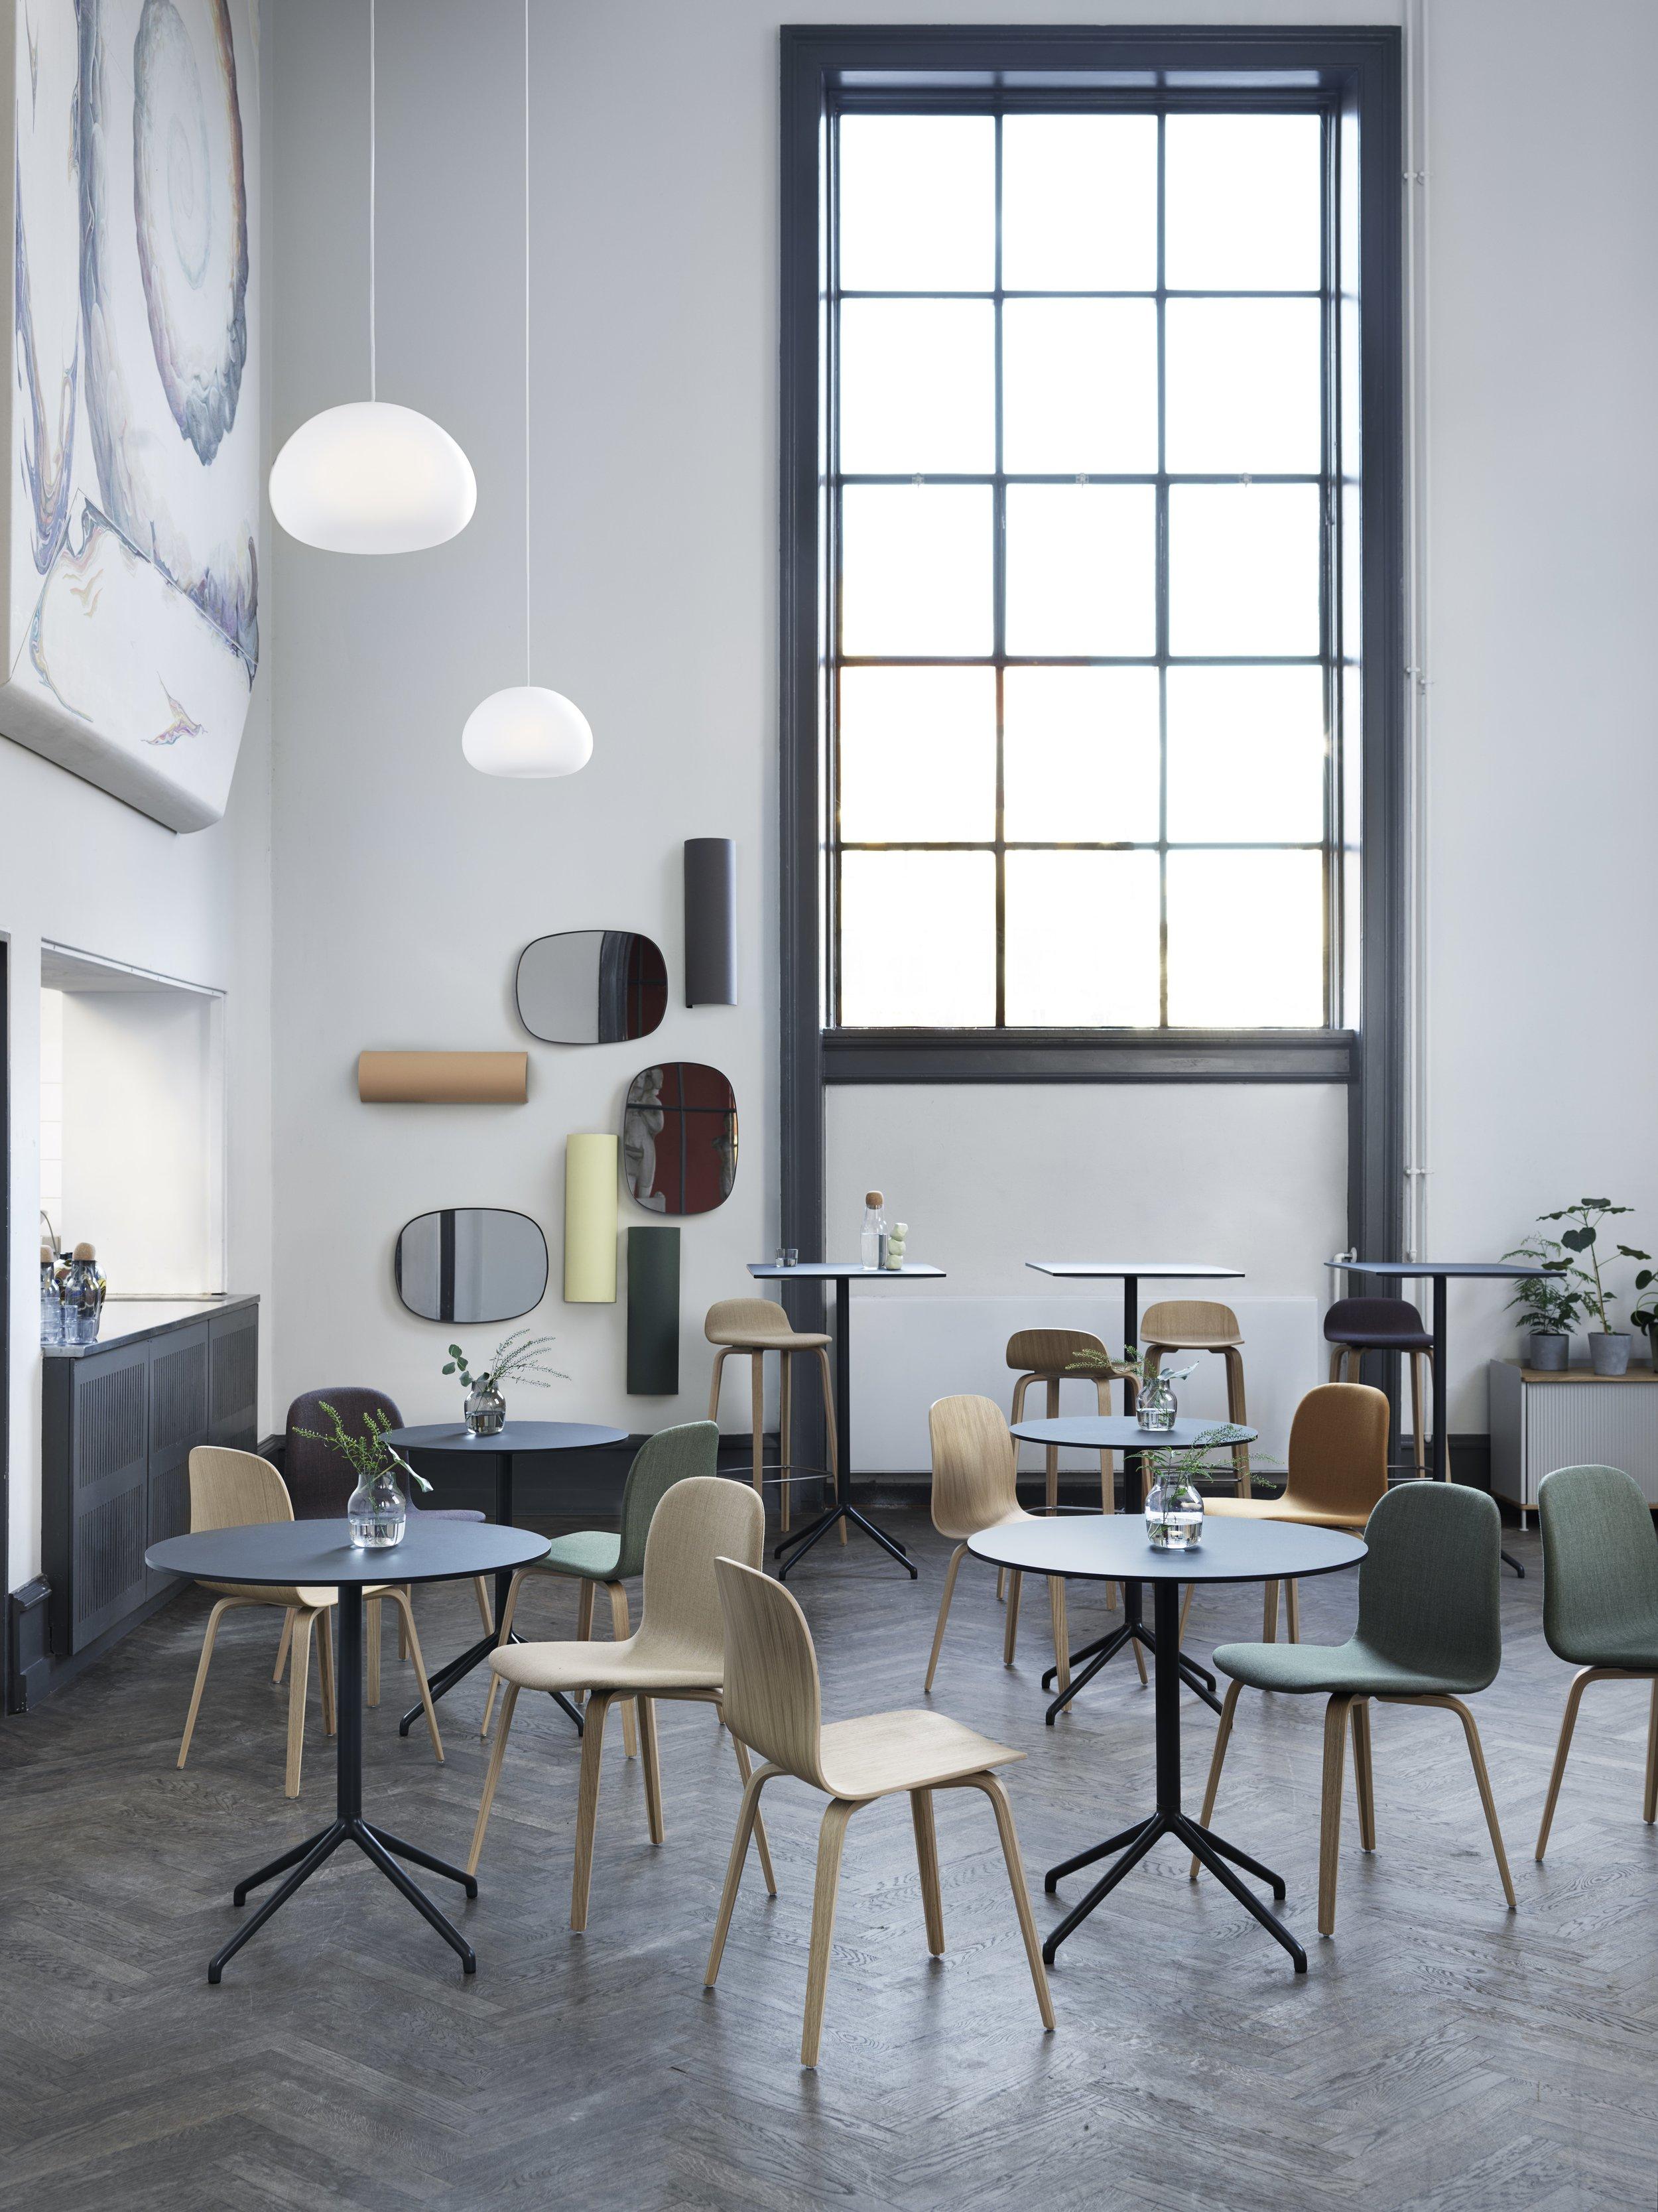 Still Café Table - 有著簡單的外表和卓越便利功能設計的 Still Café Table,可在不同的高度上提供圓形或方形的桌面,無論是任何廚房、咖啡廳、餐廳、酒吧、會議或辦公環境,Still Café Table 都優雅詮釋。